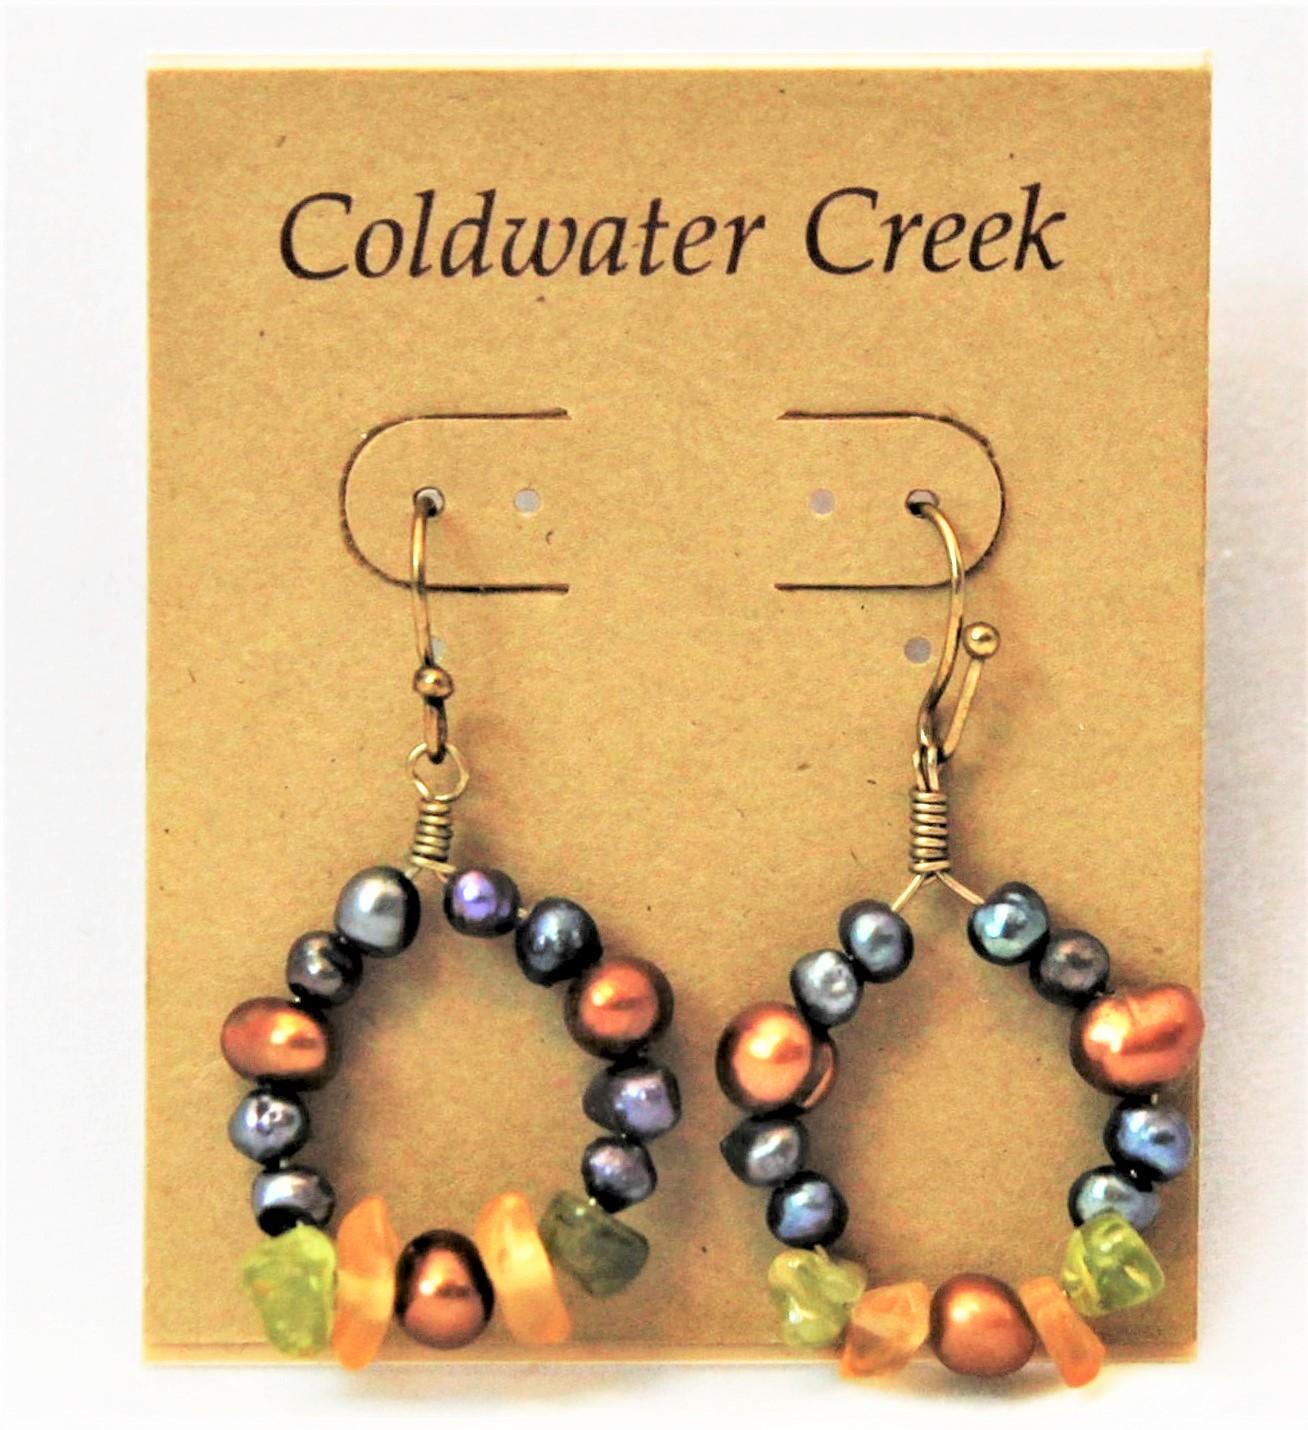 Coldwater Creek Jewelry Sale